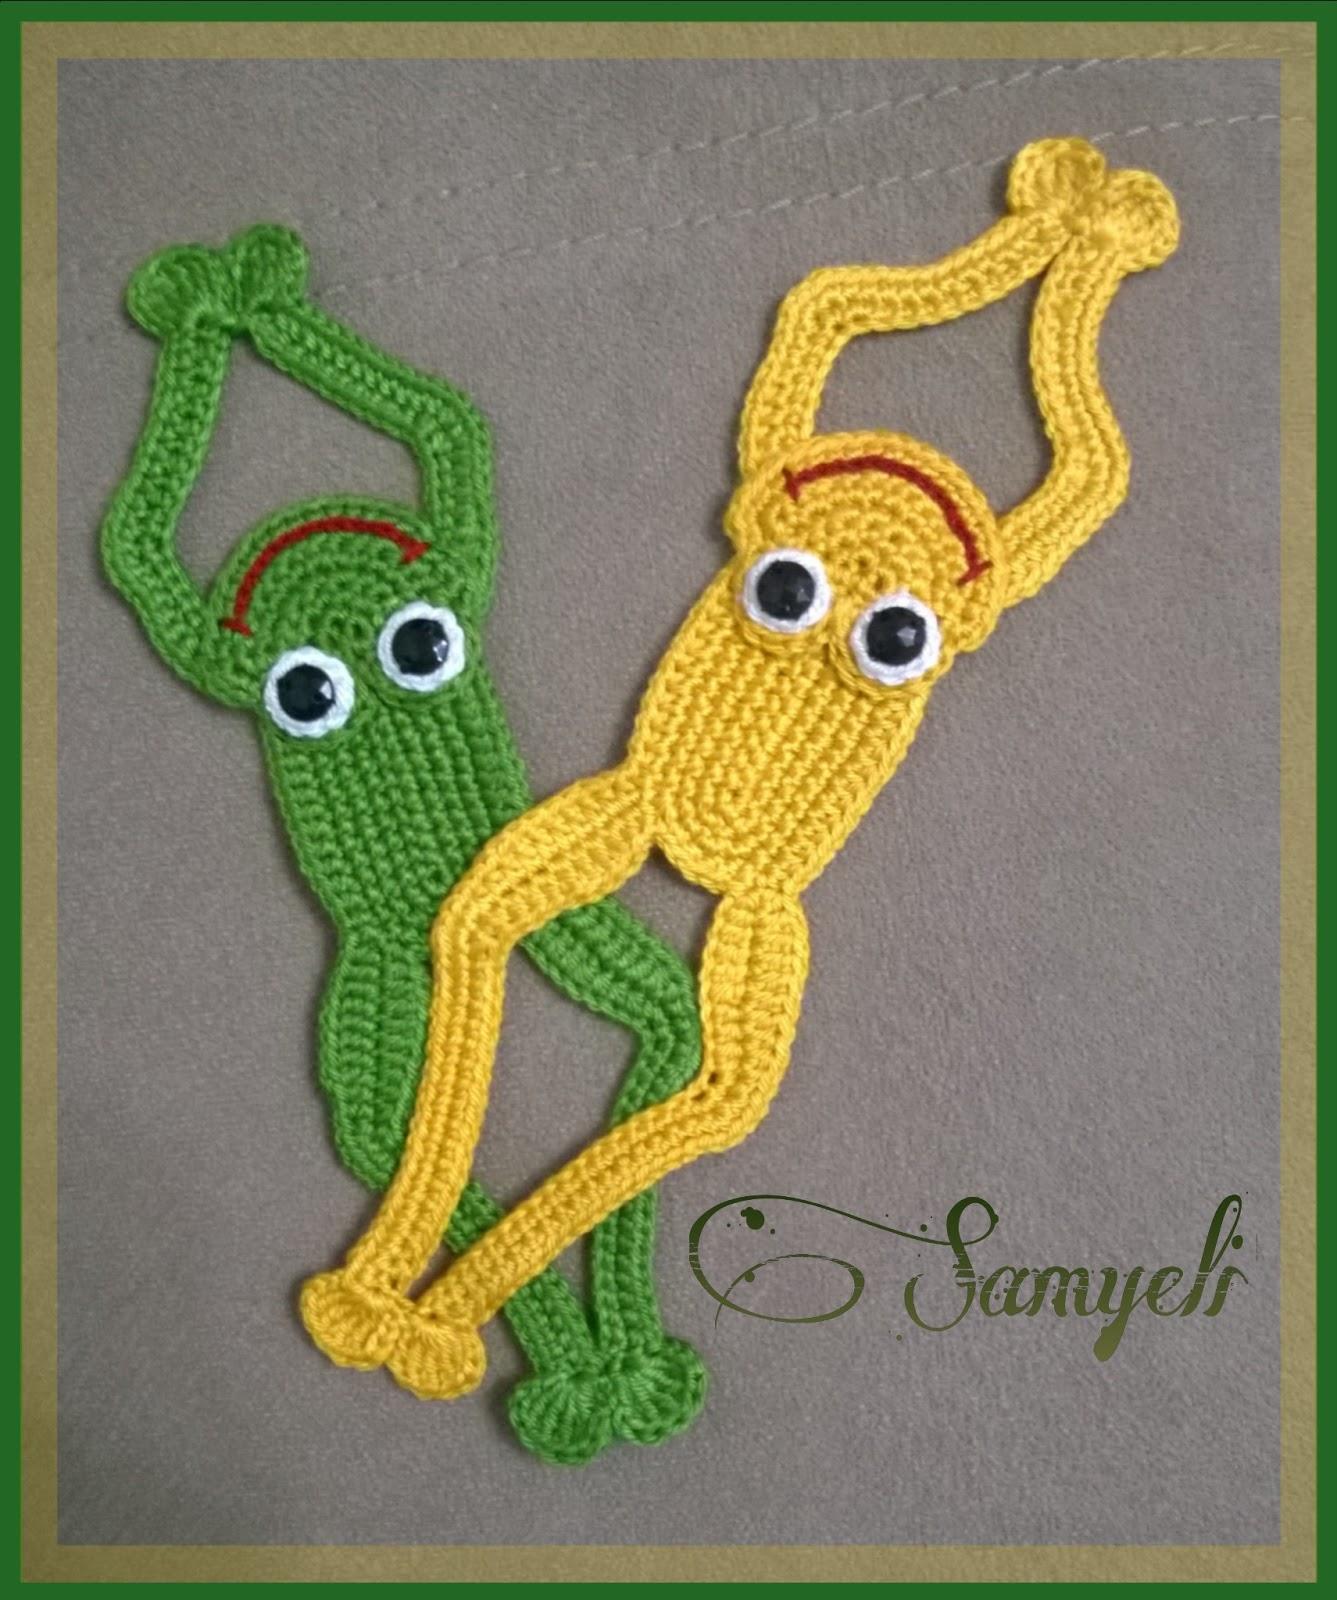 Samyelinin orguleri: Kurbaga Kitap Ayraci / Frog Bookmark